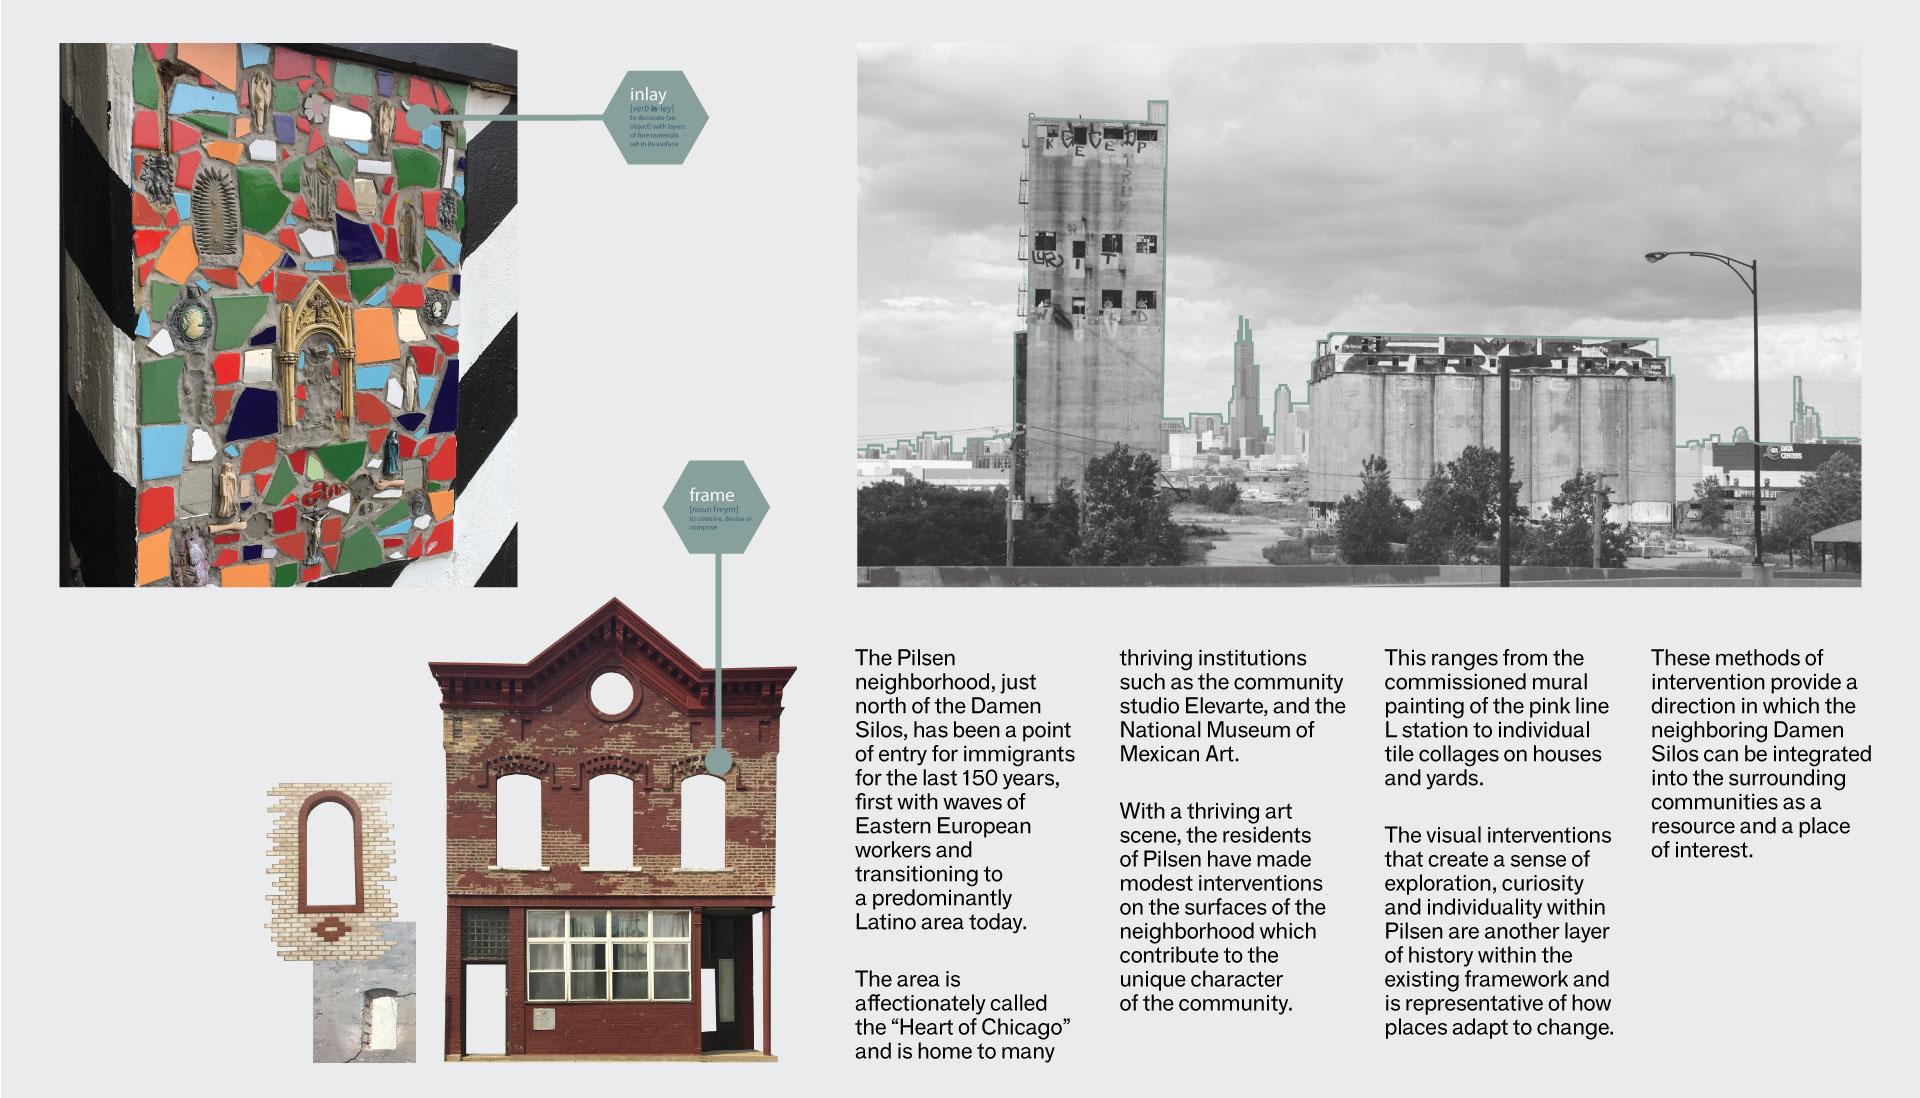 Civic - bKL Architecture